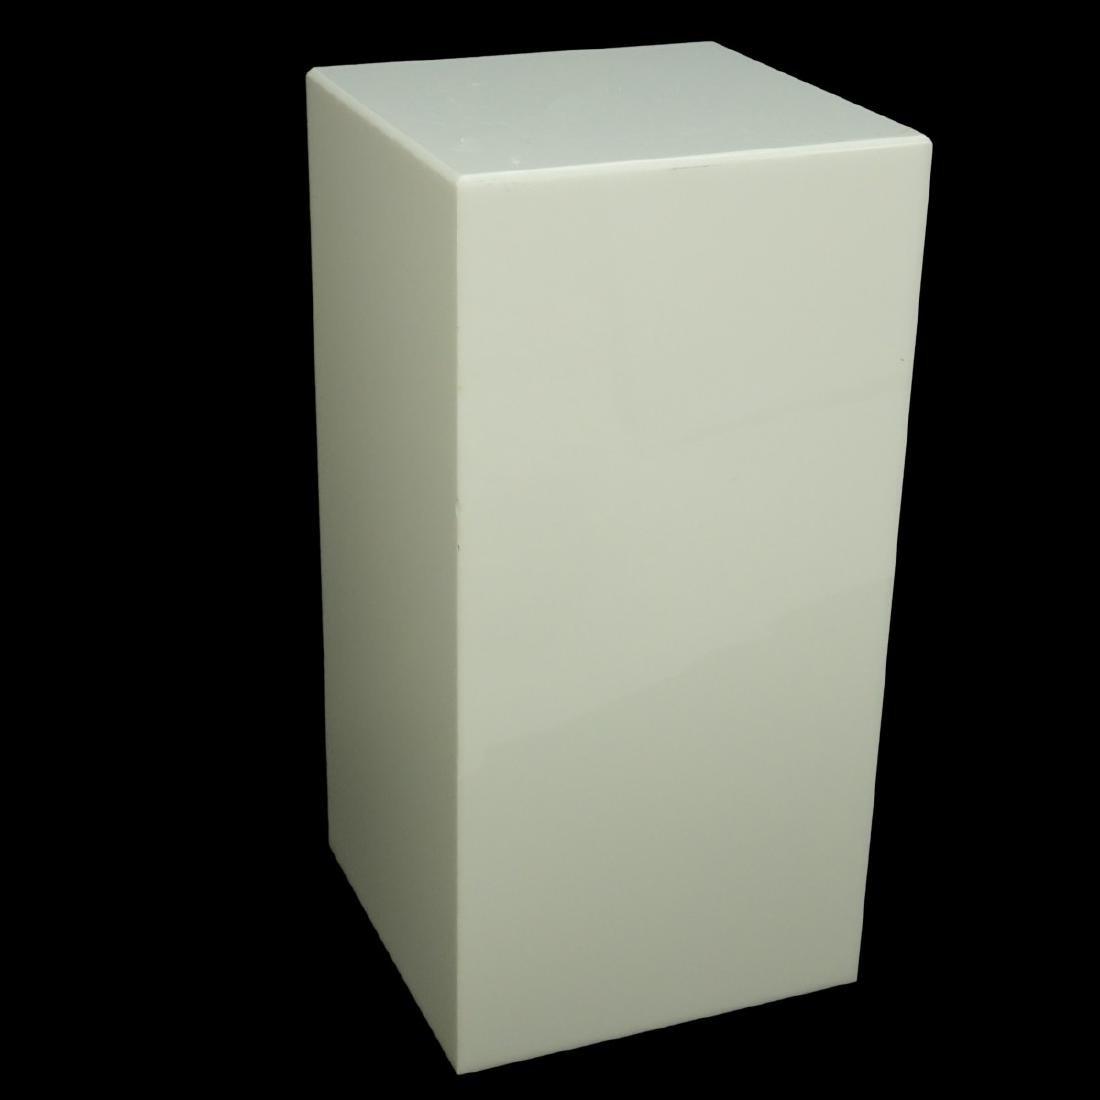 Modern White Lucite Electrified Display Pedestal